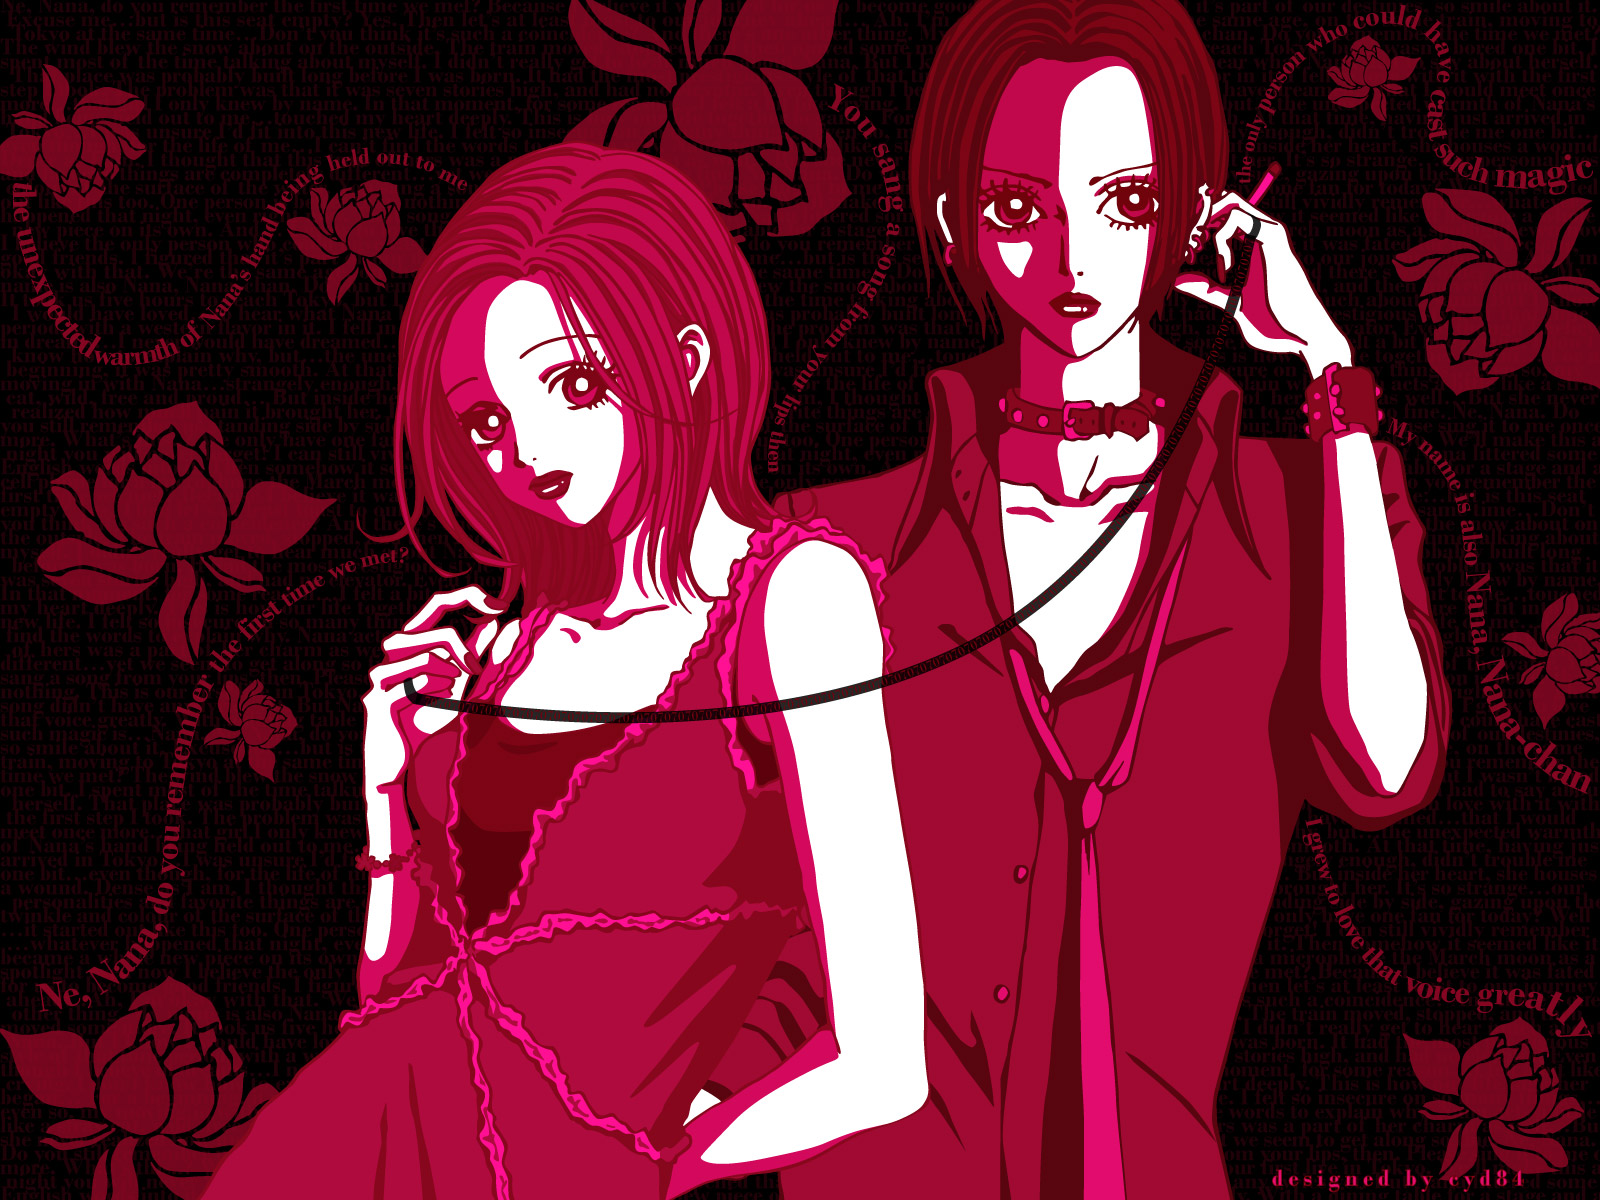 [AnimePaper]wallpapers_Nana_cyd84_24749